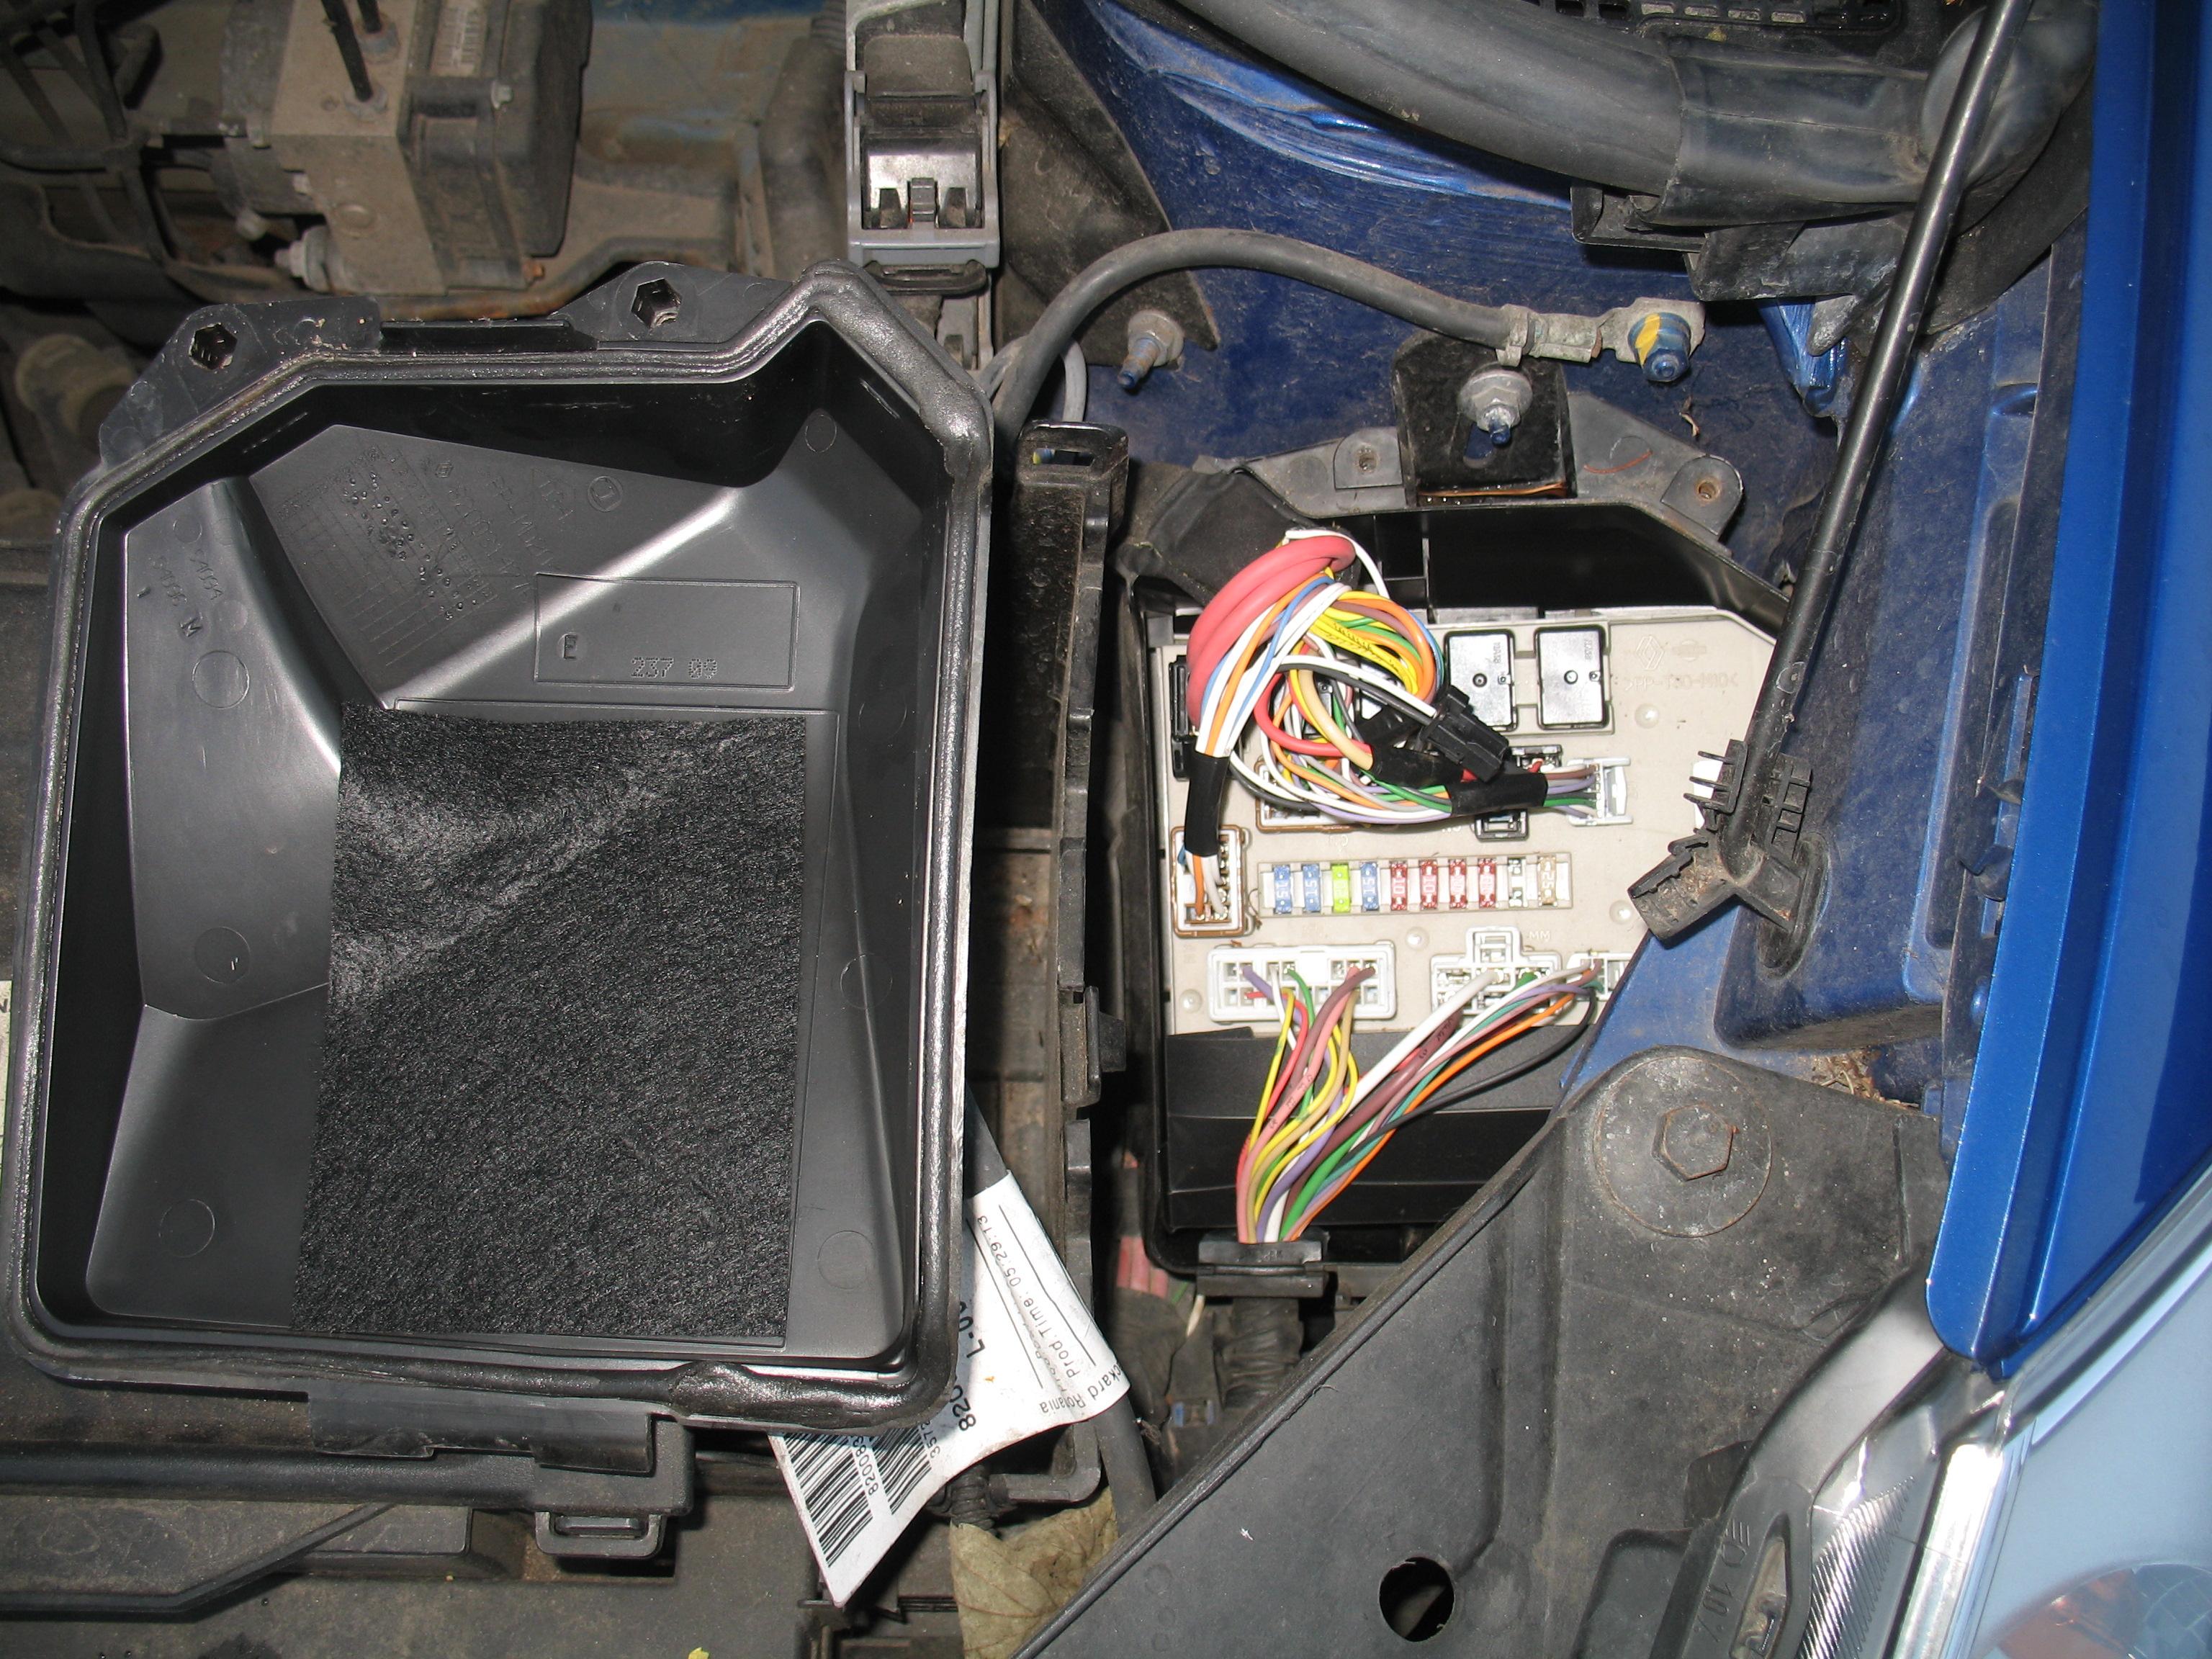 renault modus fuse box problems - 1998 arctic cat 300 wiring diagram -  cummis.bmw1992.warmi.fr  wiring diagram resource